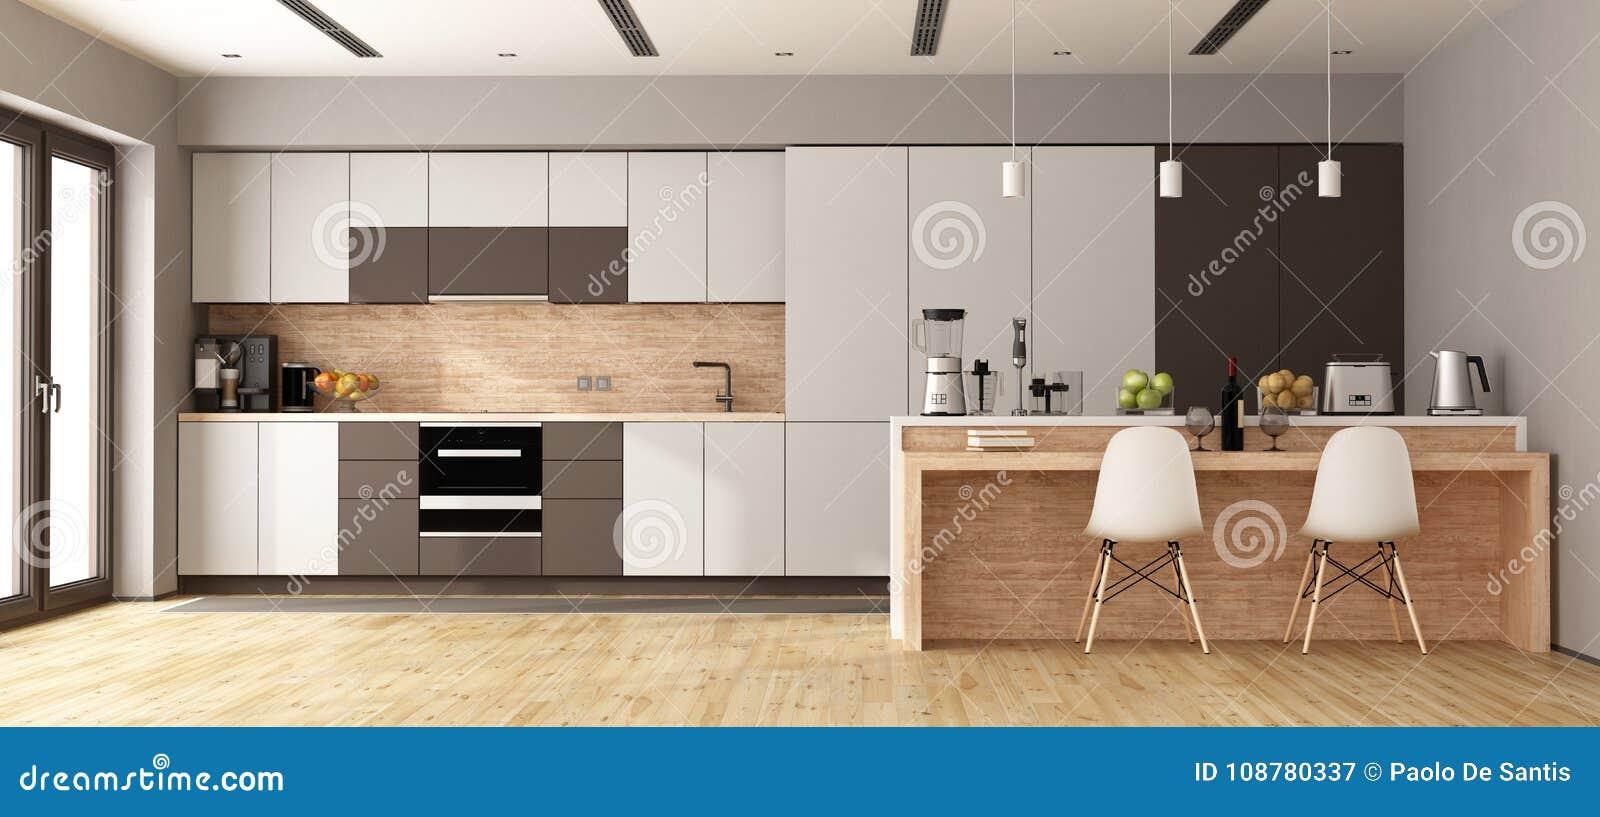 Cucina Moderna Bianca E Legno.Cucina Moderna Bianca E Marrone Illustrazione Di Stock